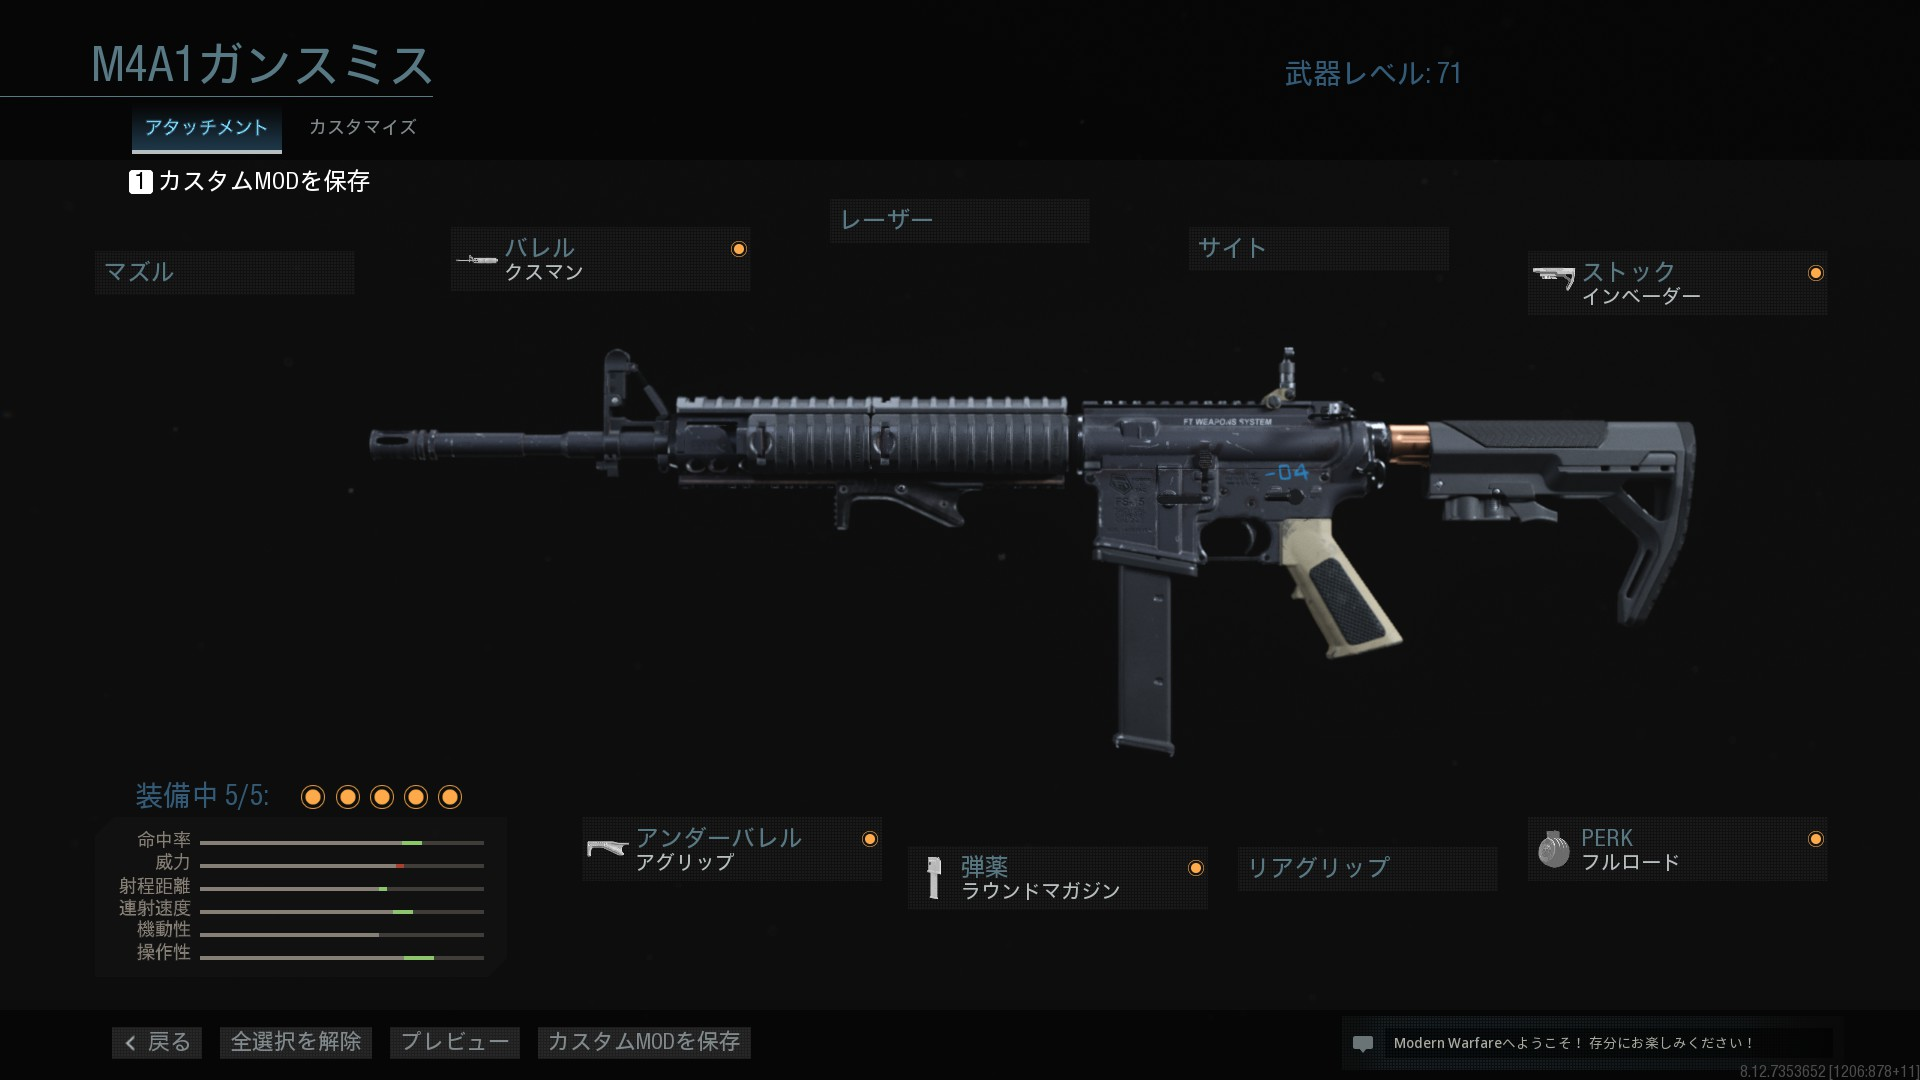 M4SMGD.jpg